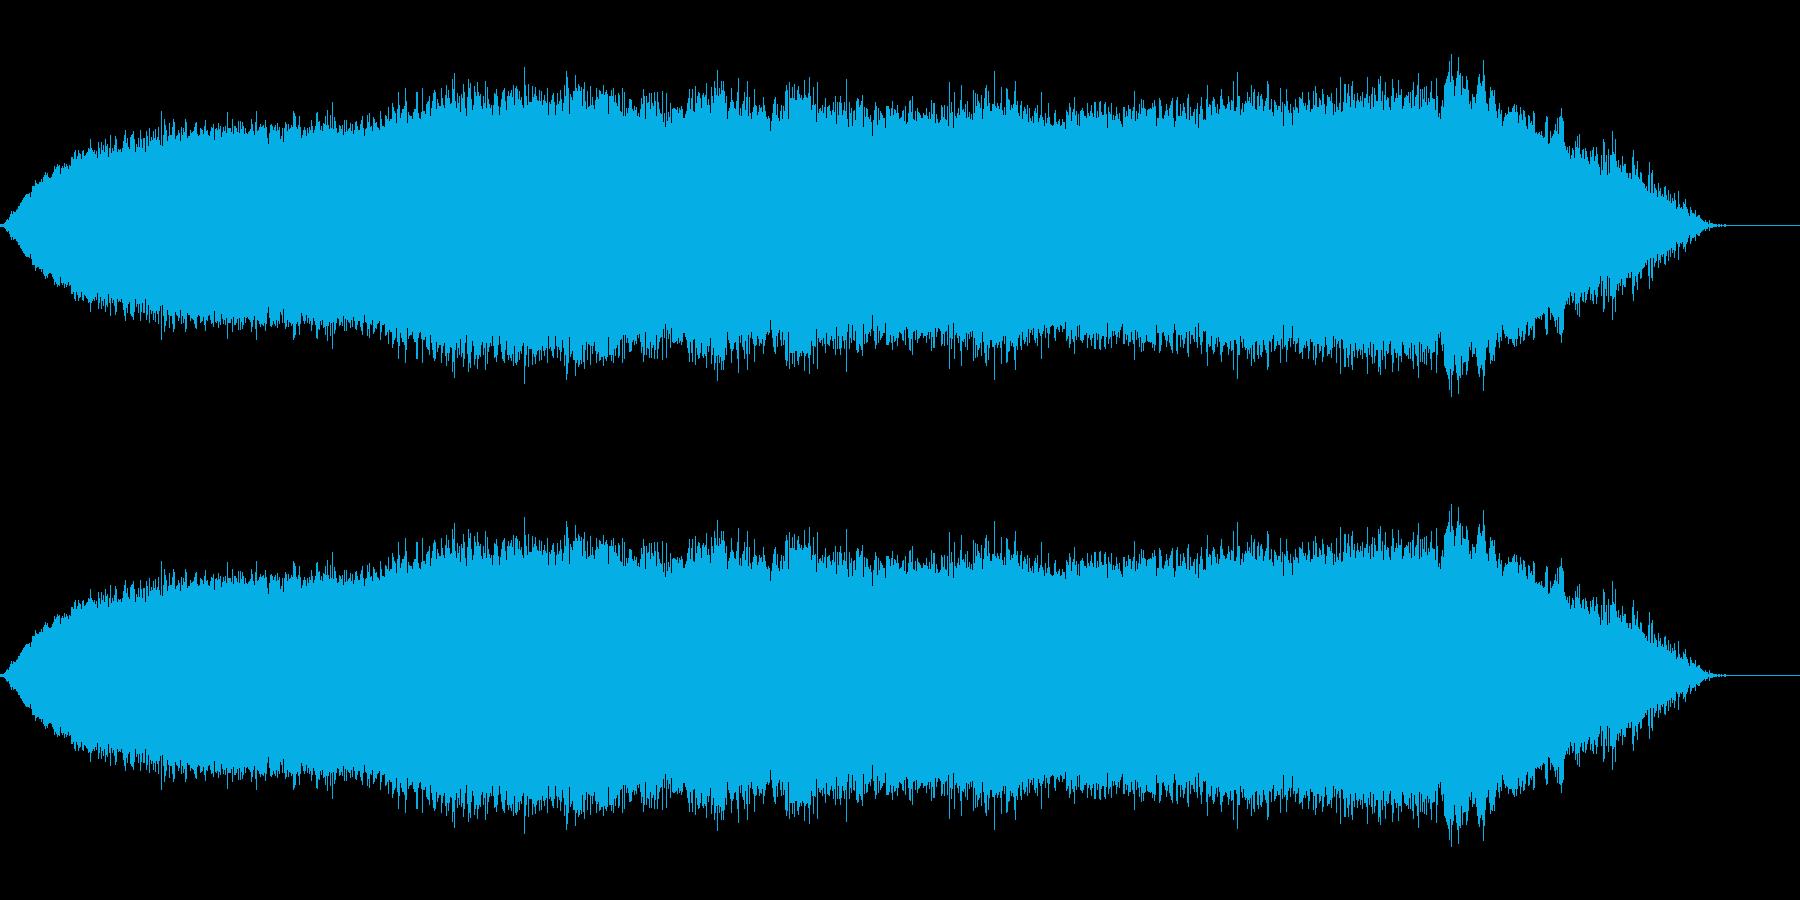 Drill アニメ風ドリル音 歯医者 2の再生済みの波形